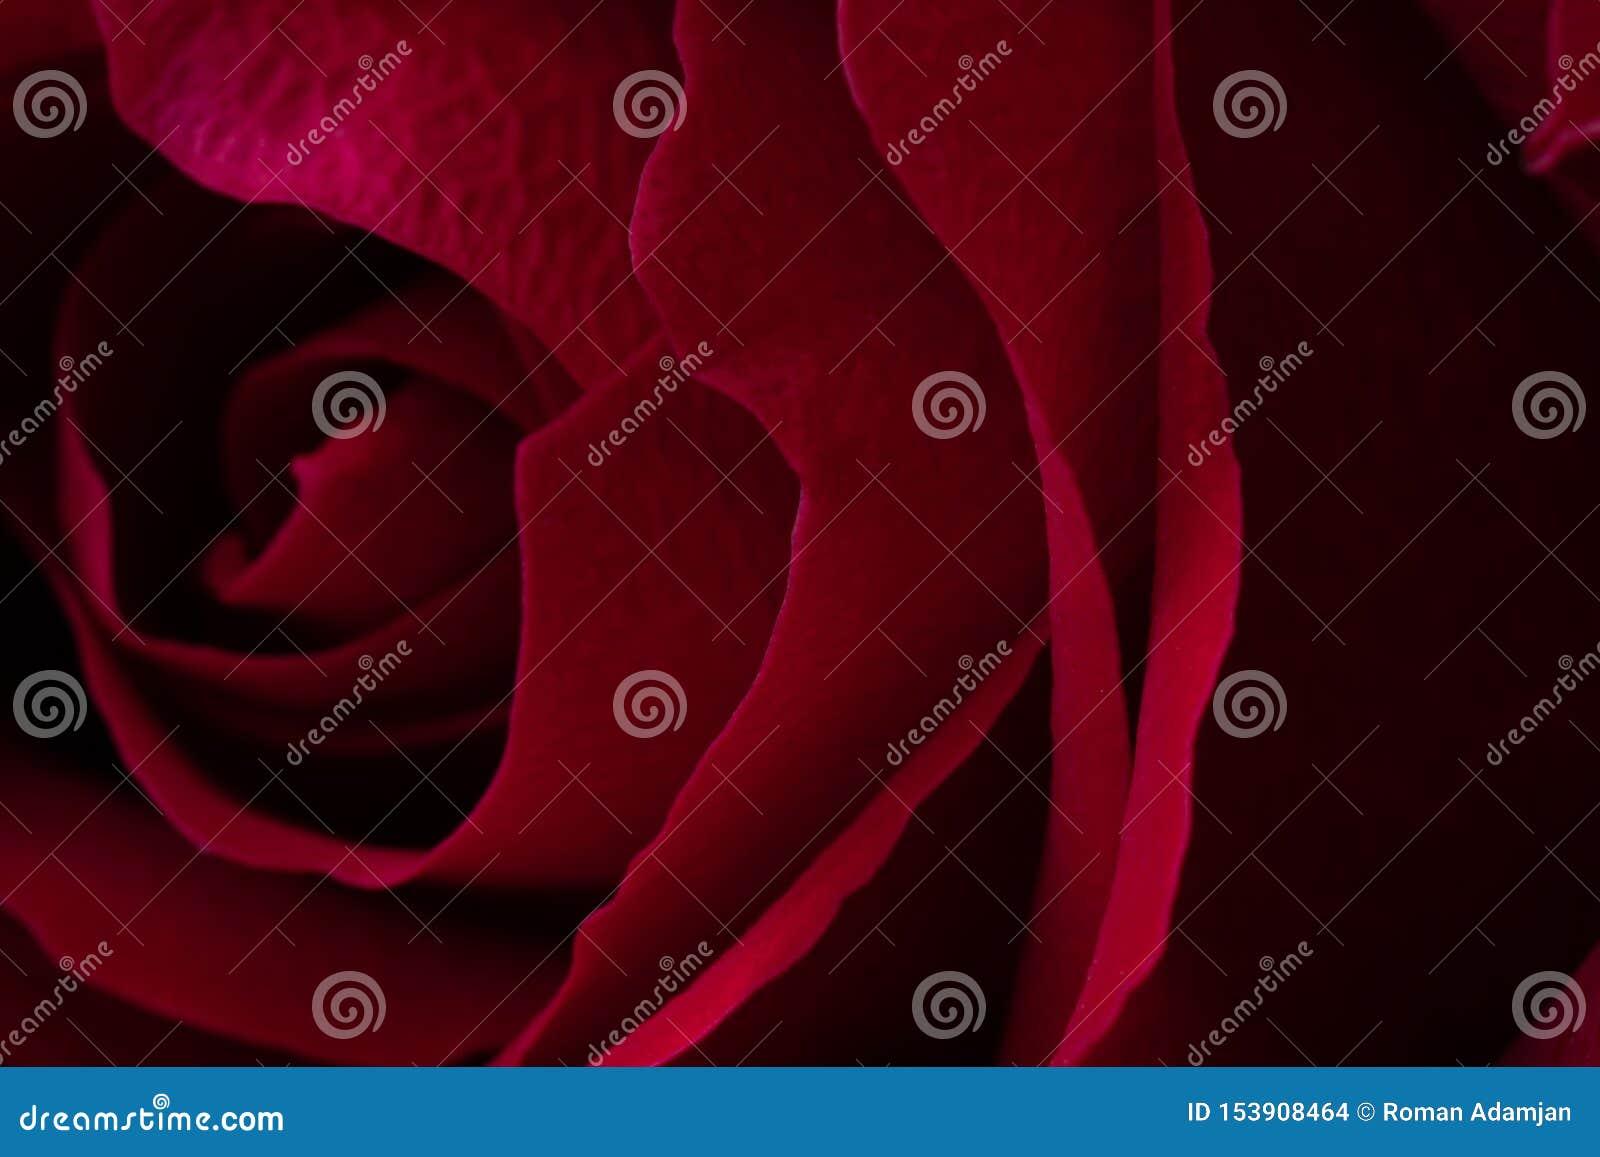 A close up macro shot of a red rose.